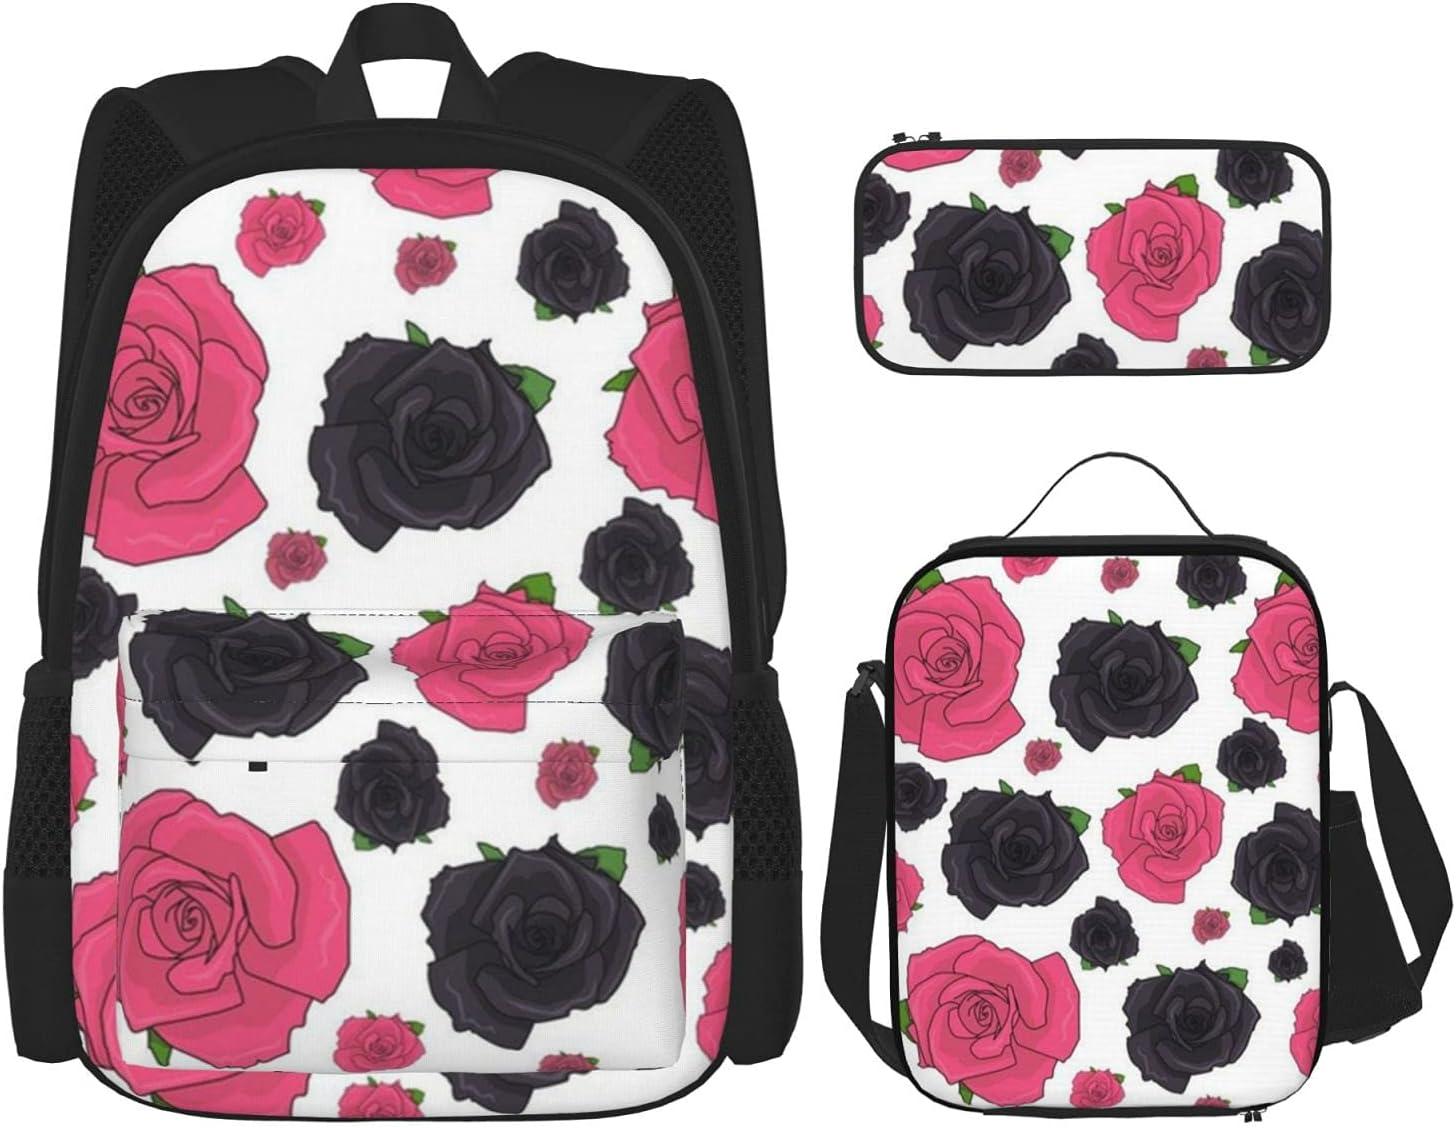 Dallas Mall Roses Pattern Black Ranking TOP19 School Bags Lunch 3pcs Box Pencil Combi Case